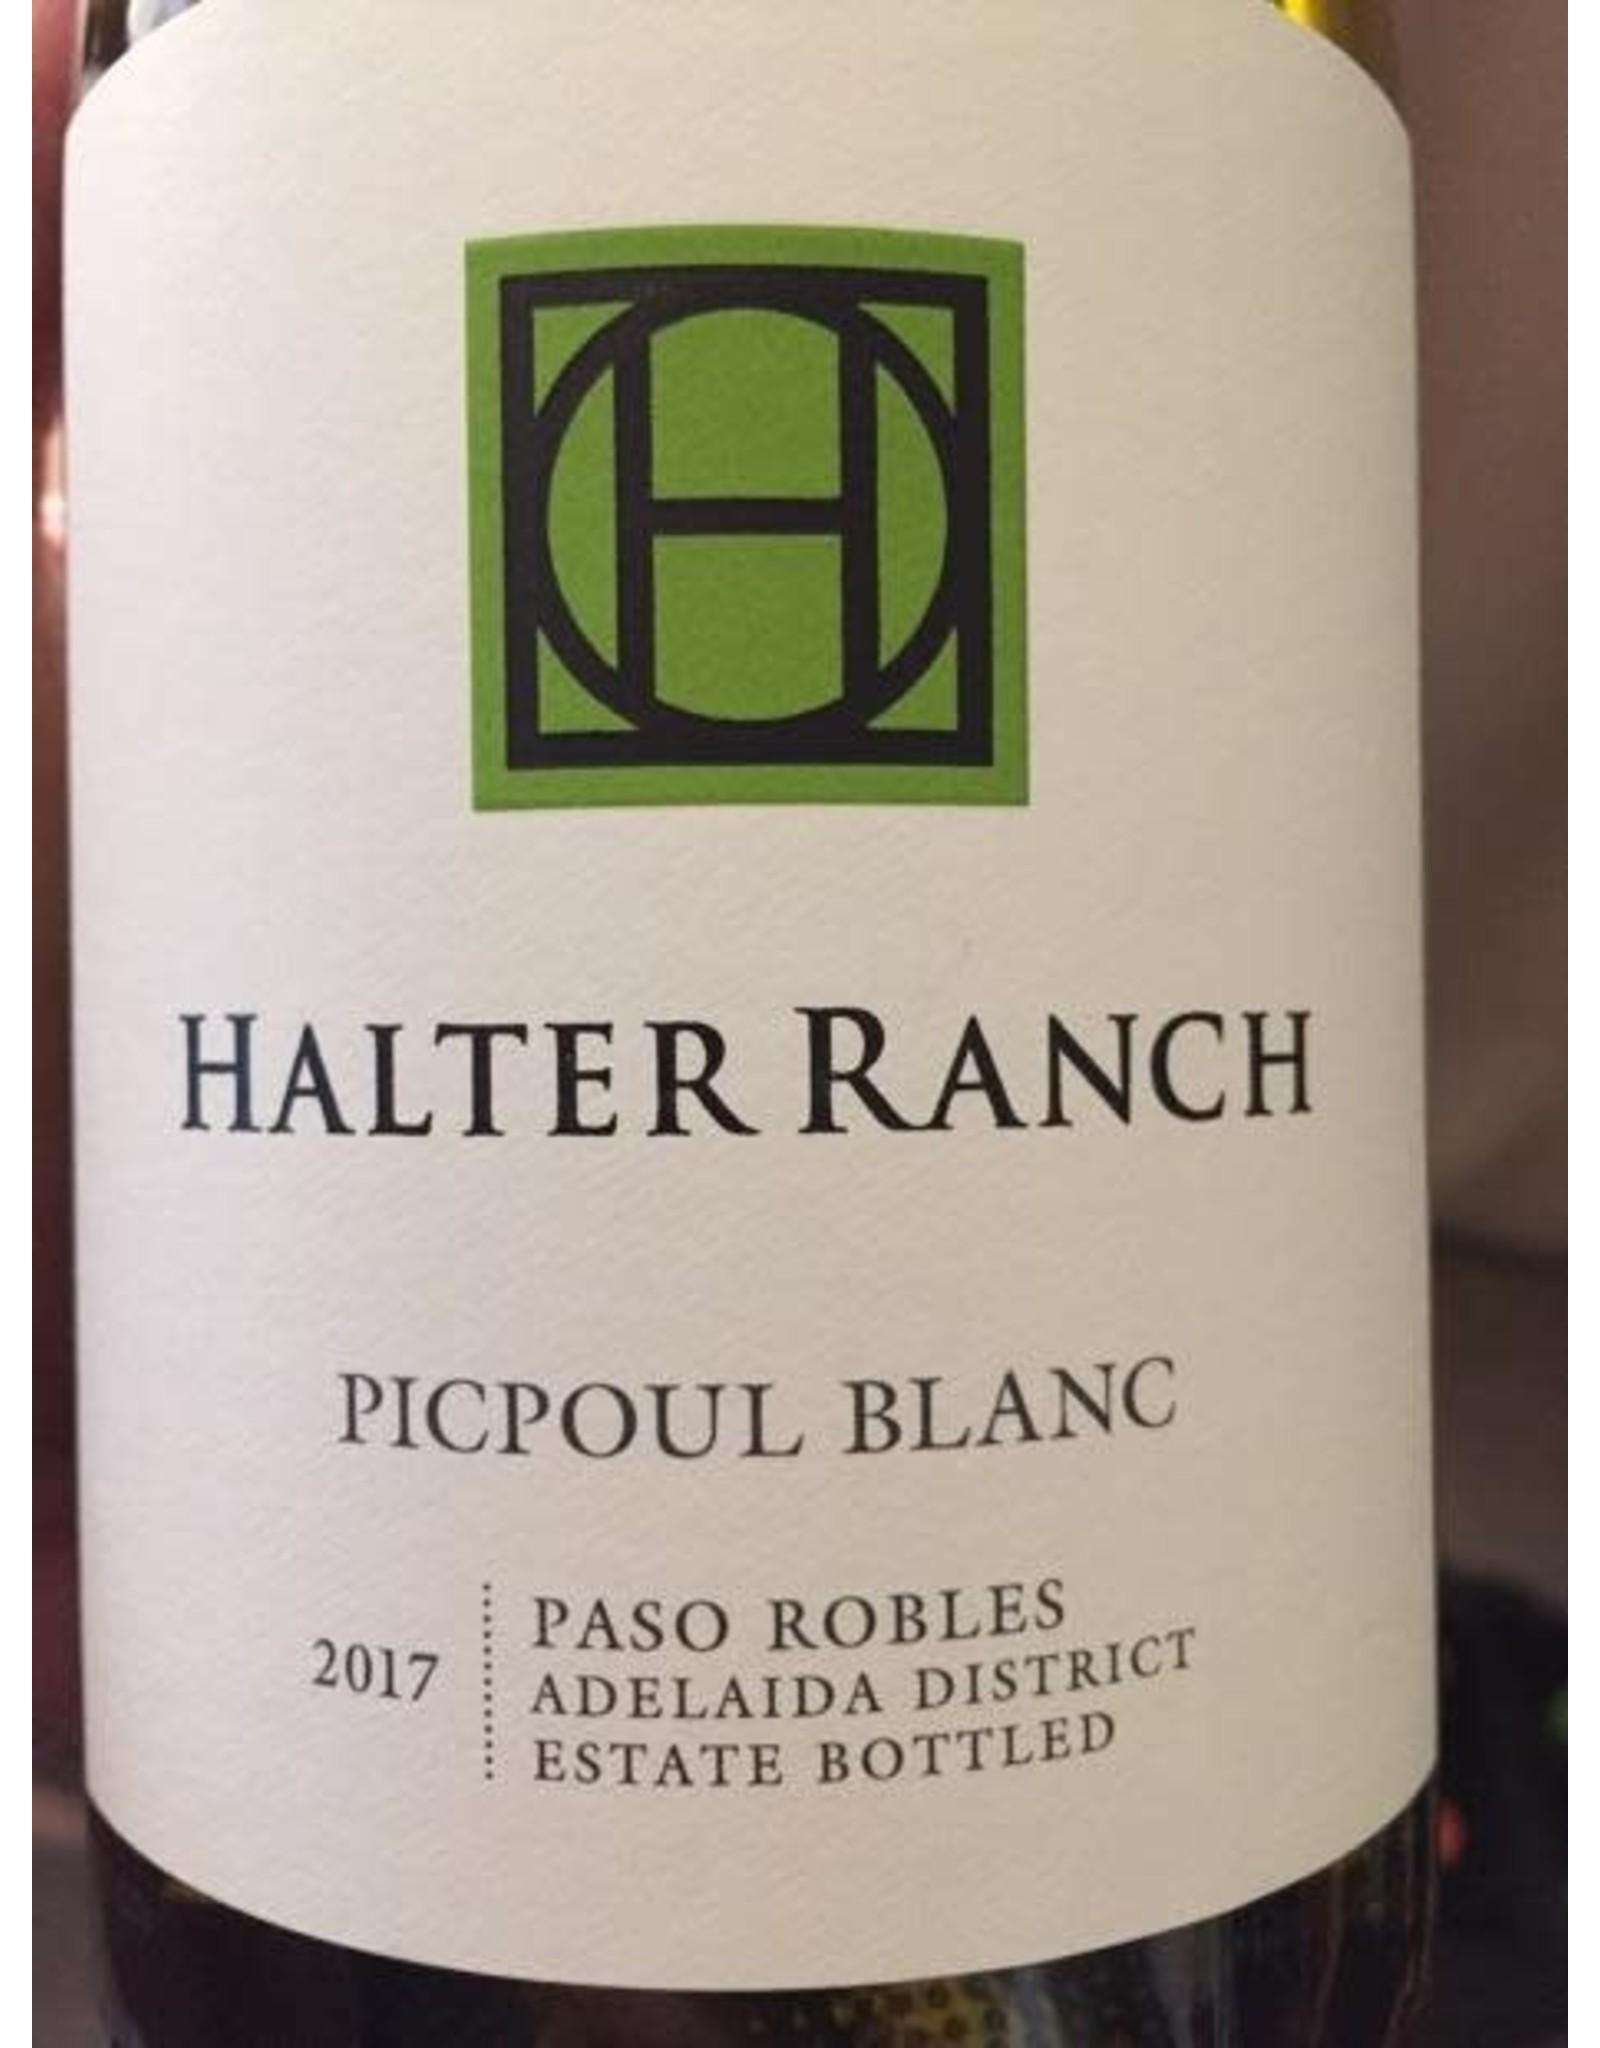 2017 Halter Ranch Picpoul Blanc